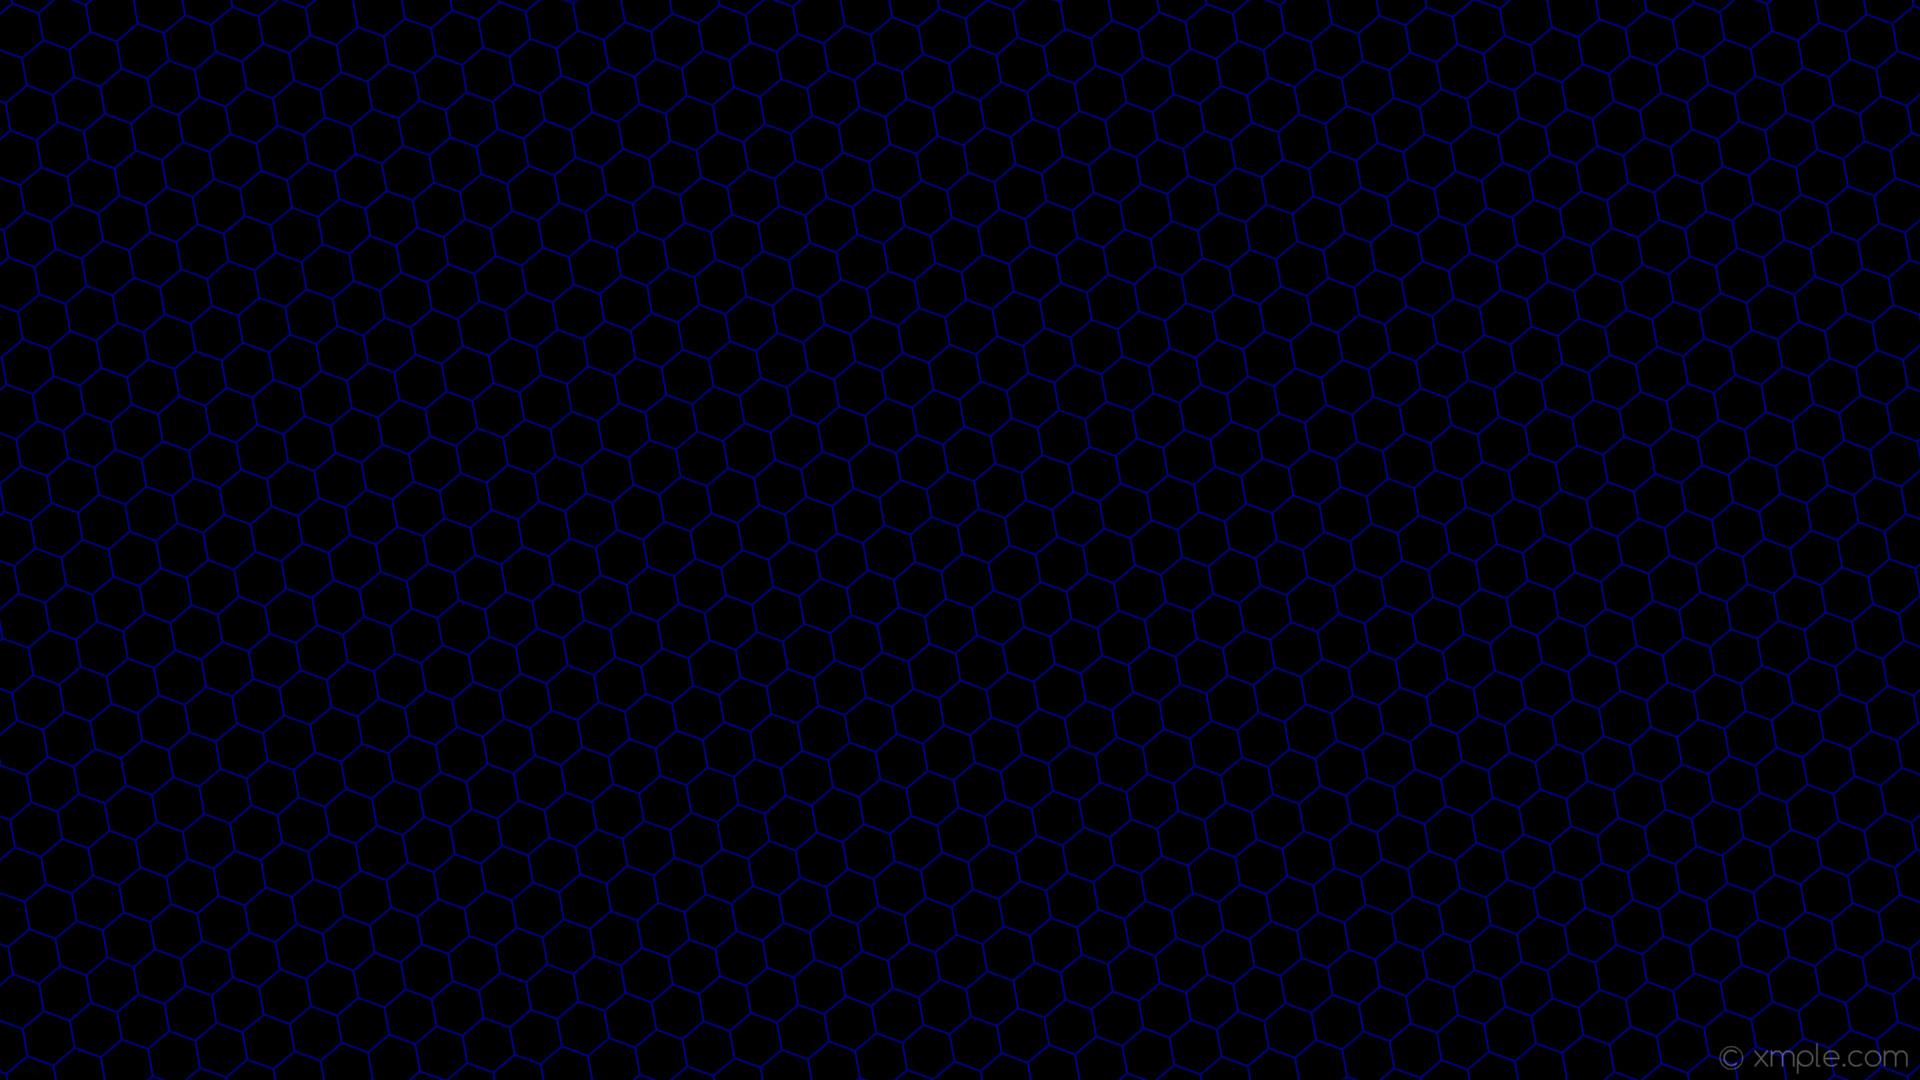 wallpaper honeycomb black beehive blue hexagon navy #000000 #000080  diagonal 10° 2px 48px